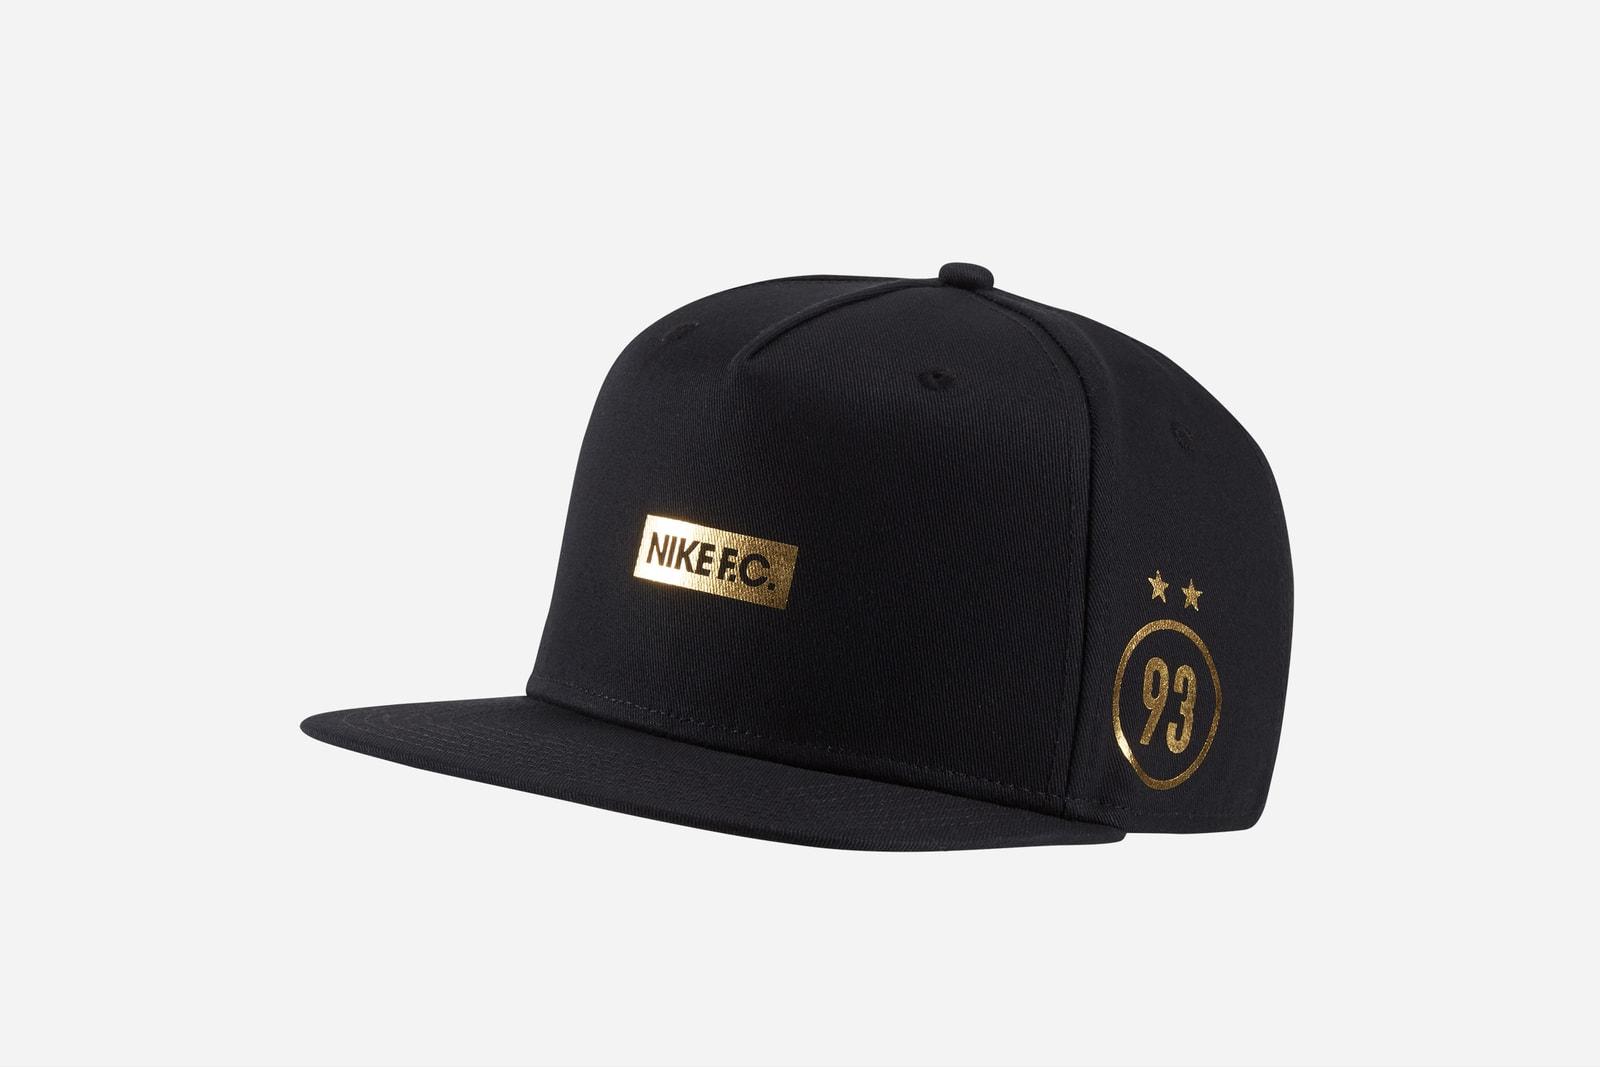 Nike Kylian Mbappé collection Bondy Dreams